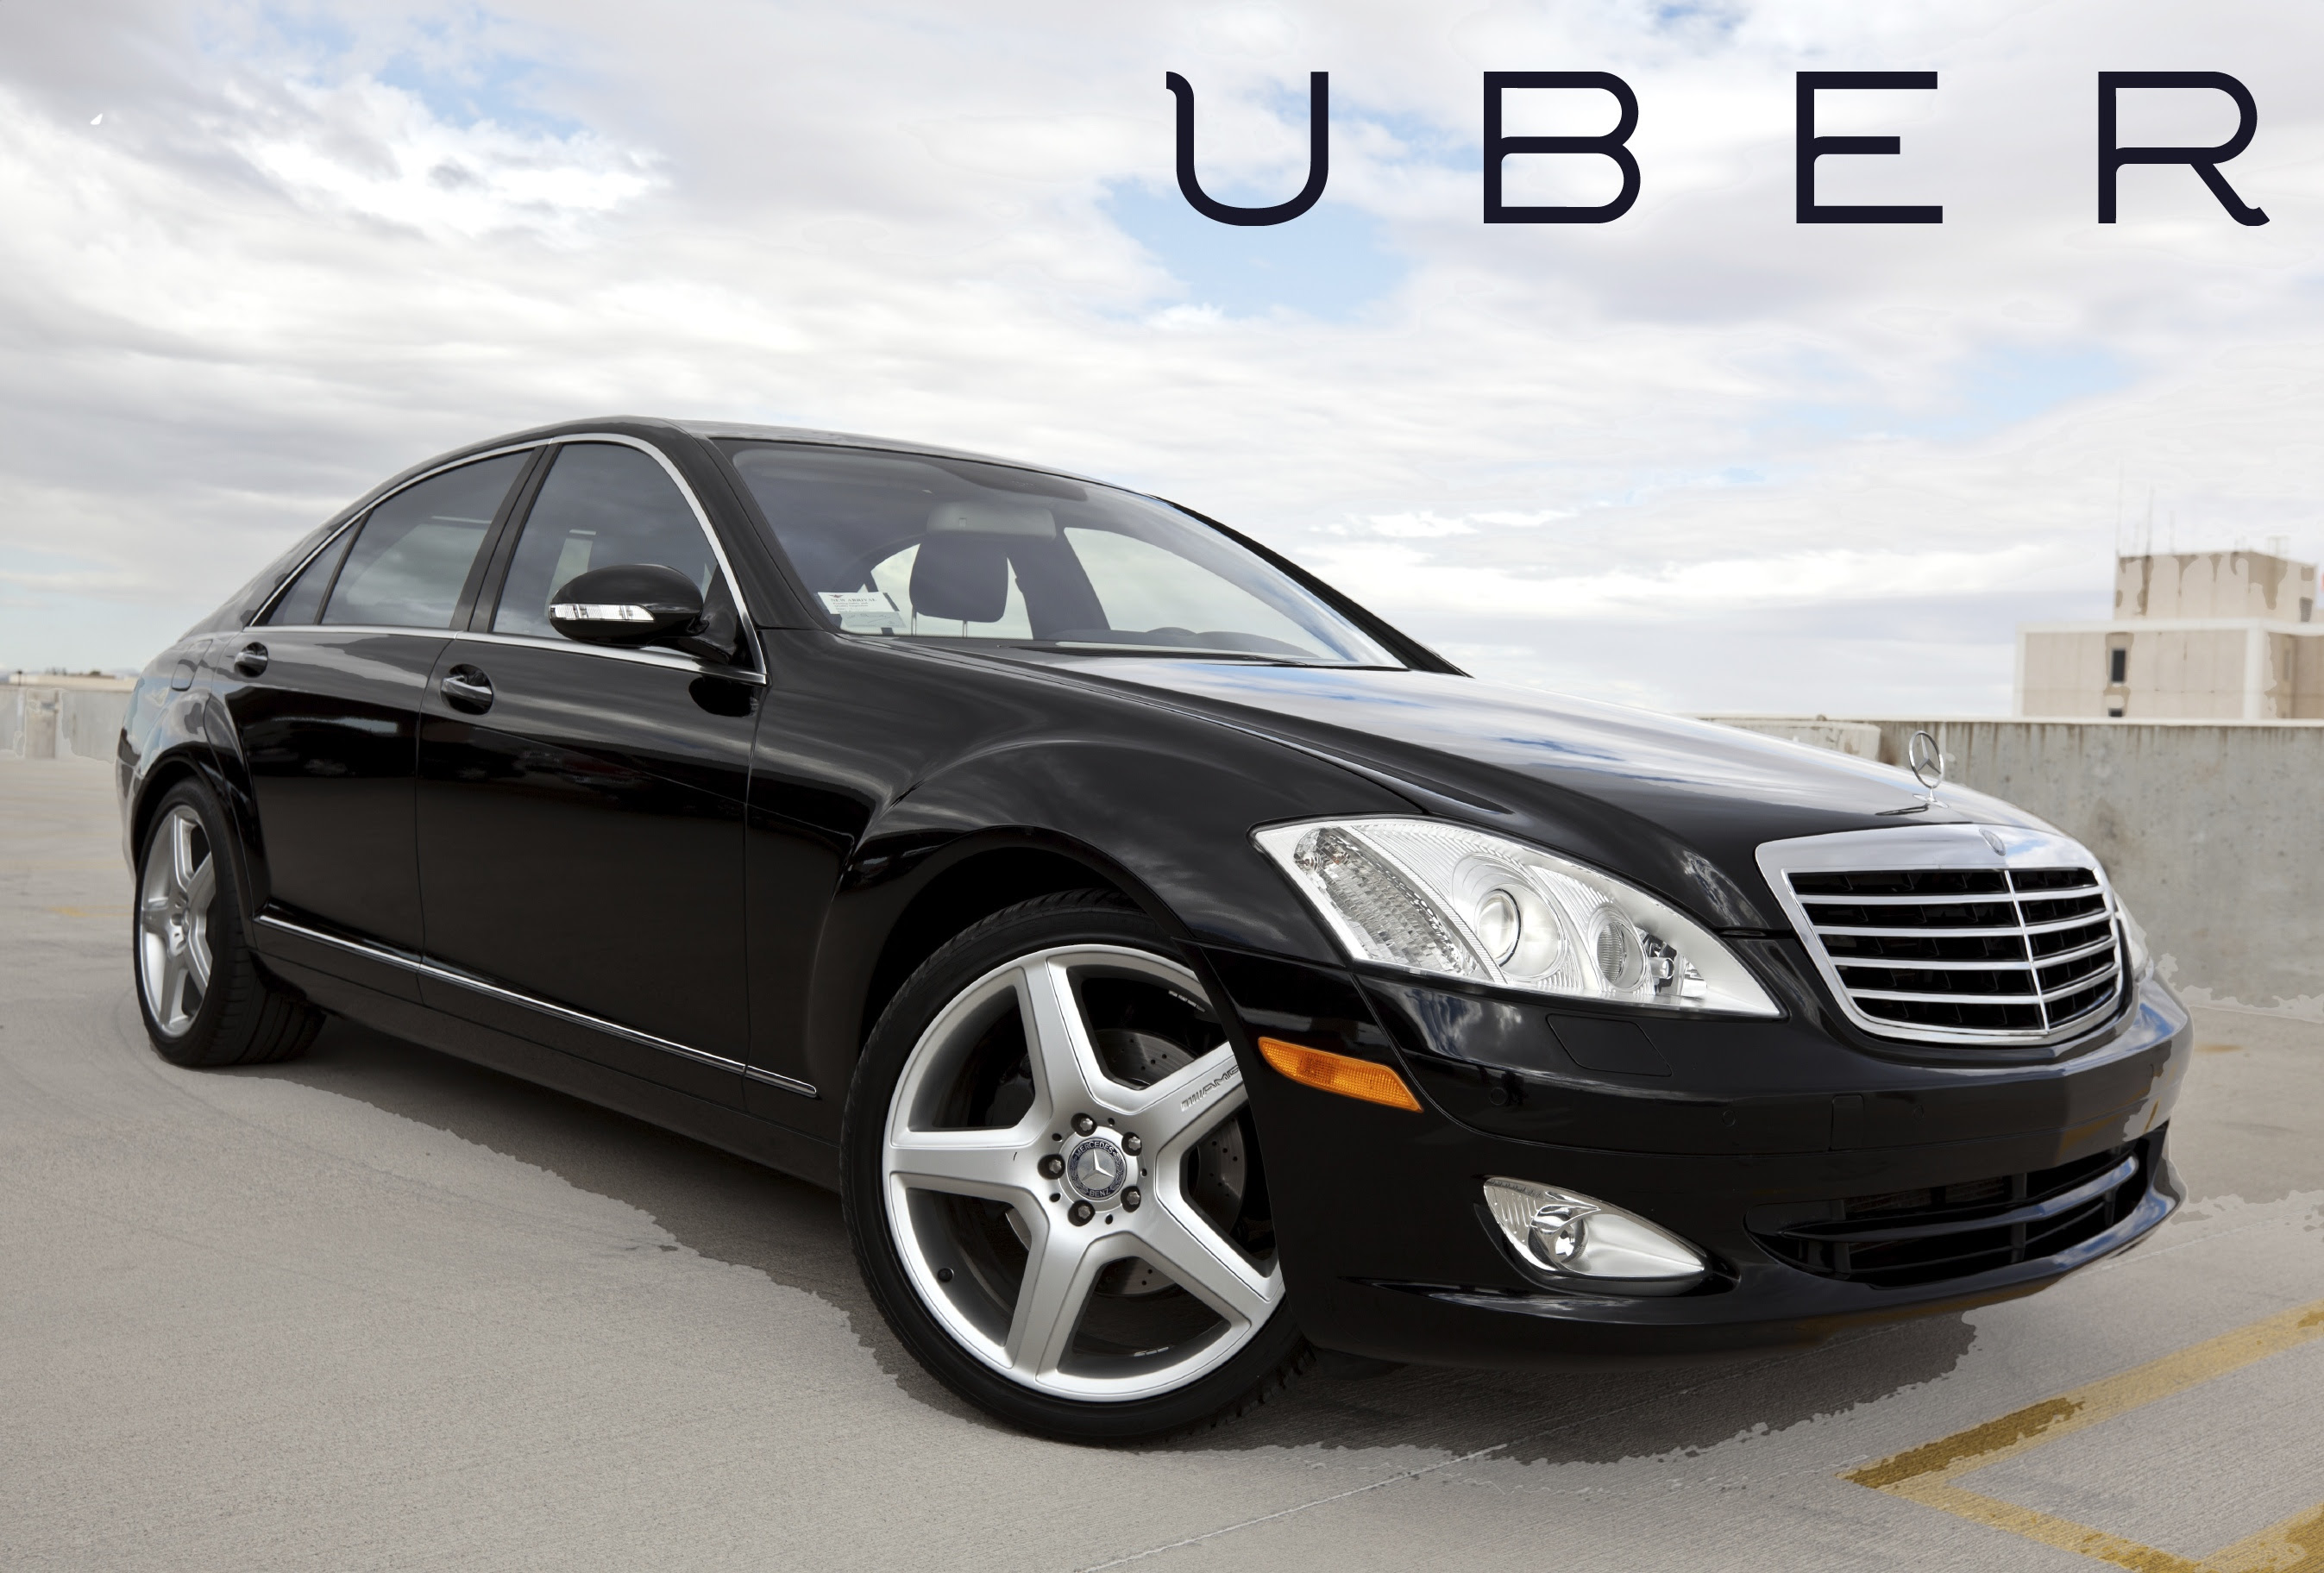 driving for uber black car